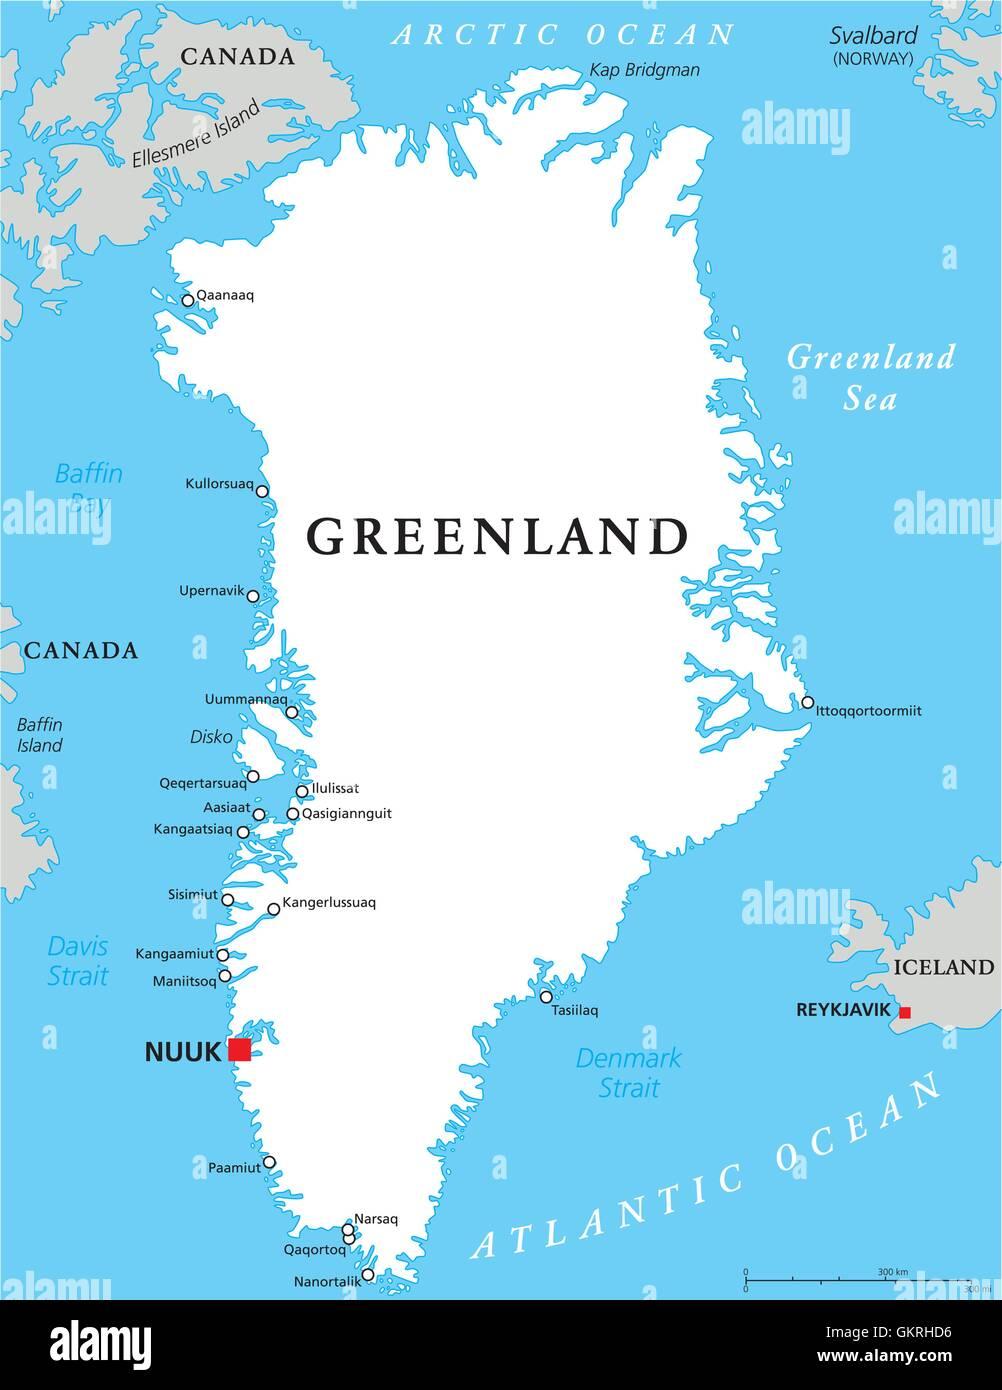 Arctic greenland denmark map atlas map of the world travel arctic arctic greenland denmark map atlas map of the world travel arctic greenland europe denmark atlantic gumiabroncs Choice Image